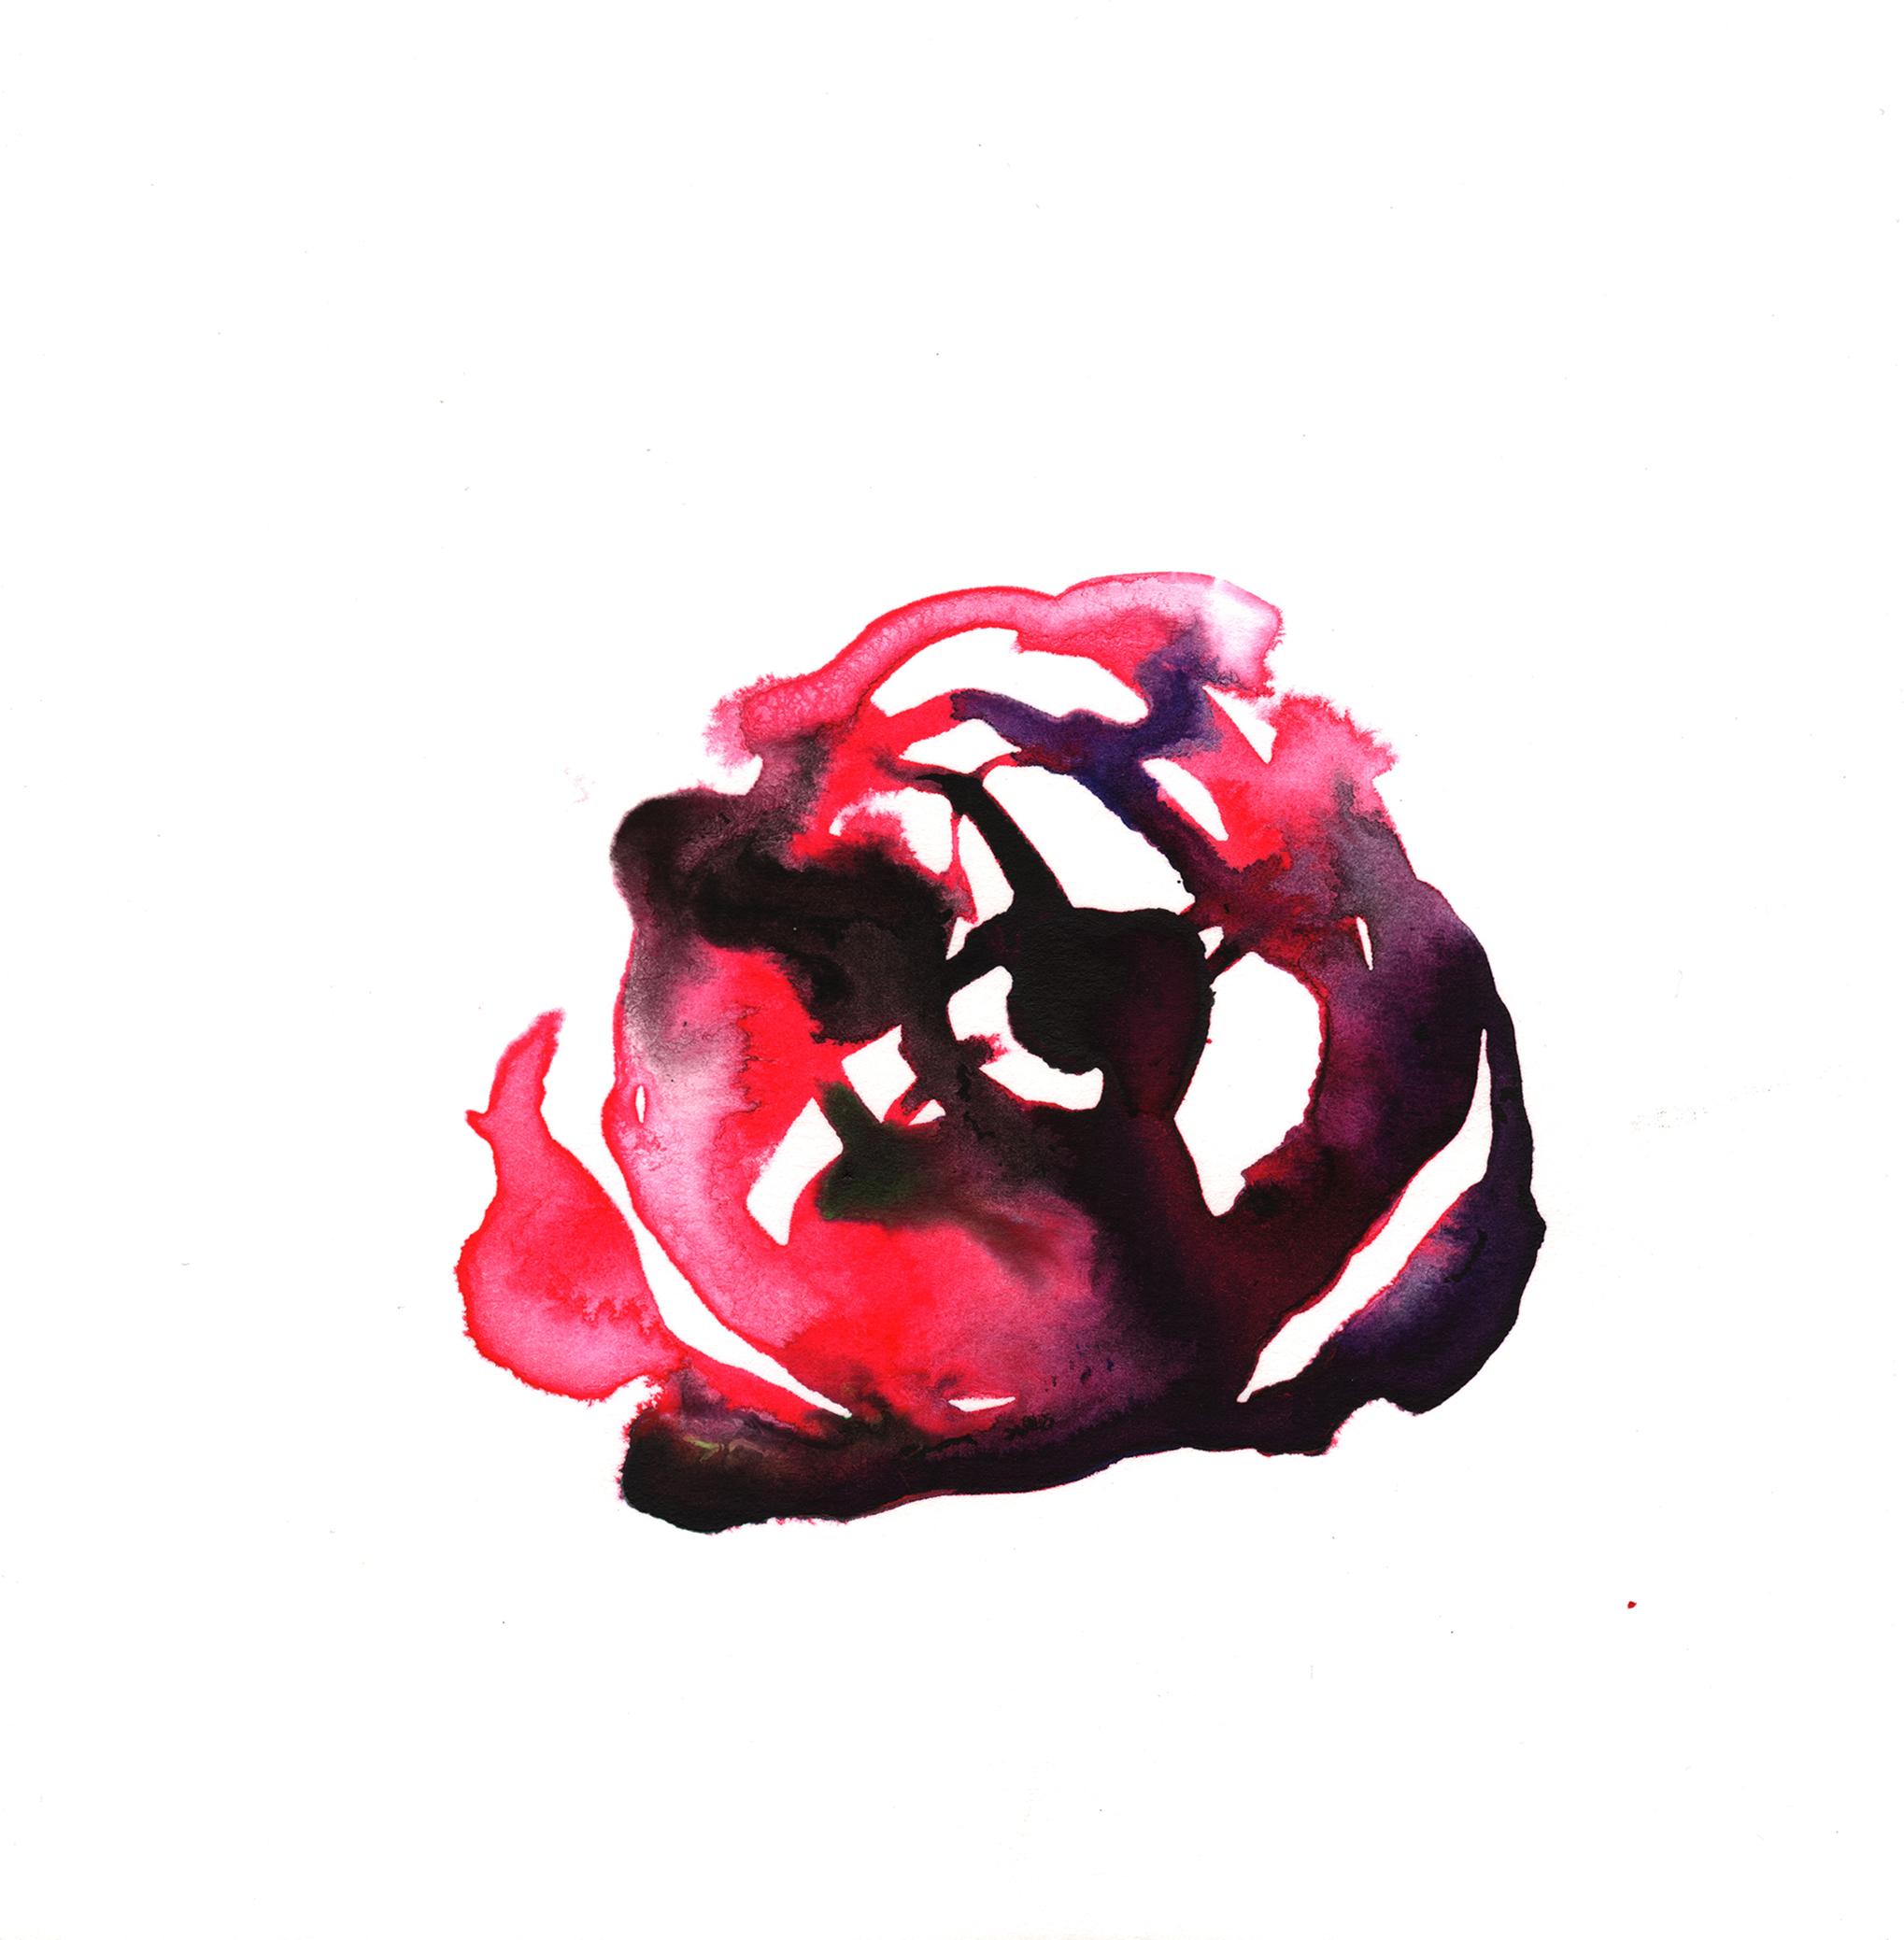 308.Rose.12.13.14.jpg